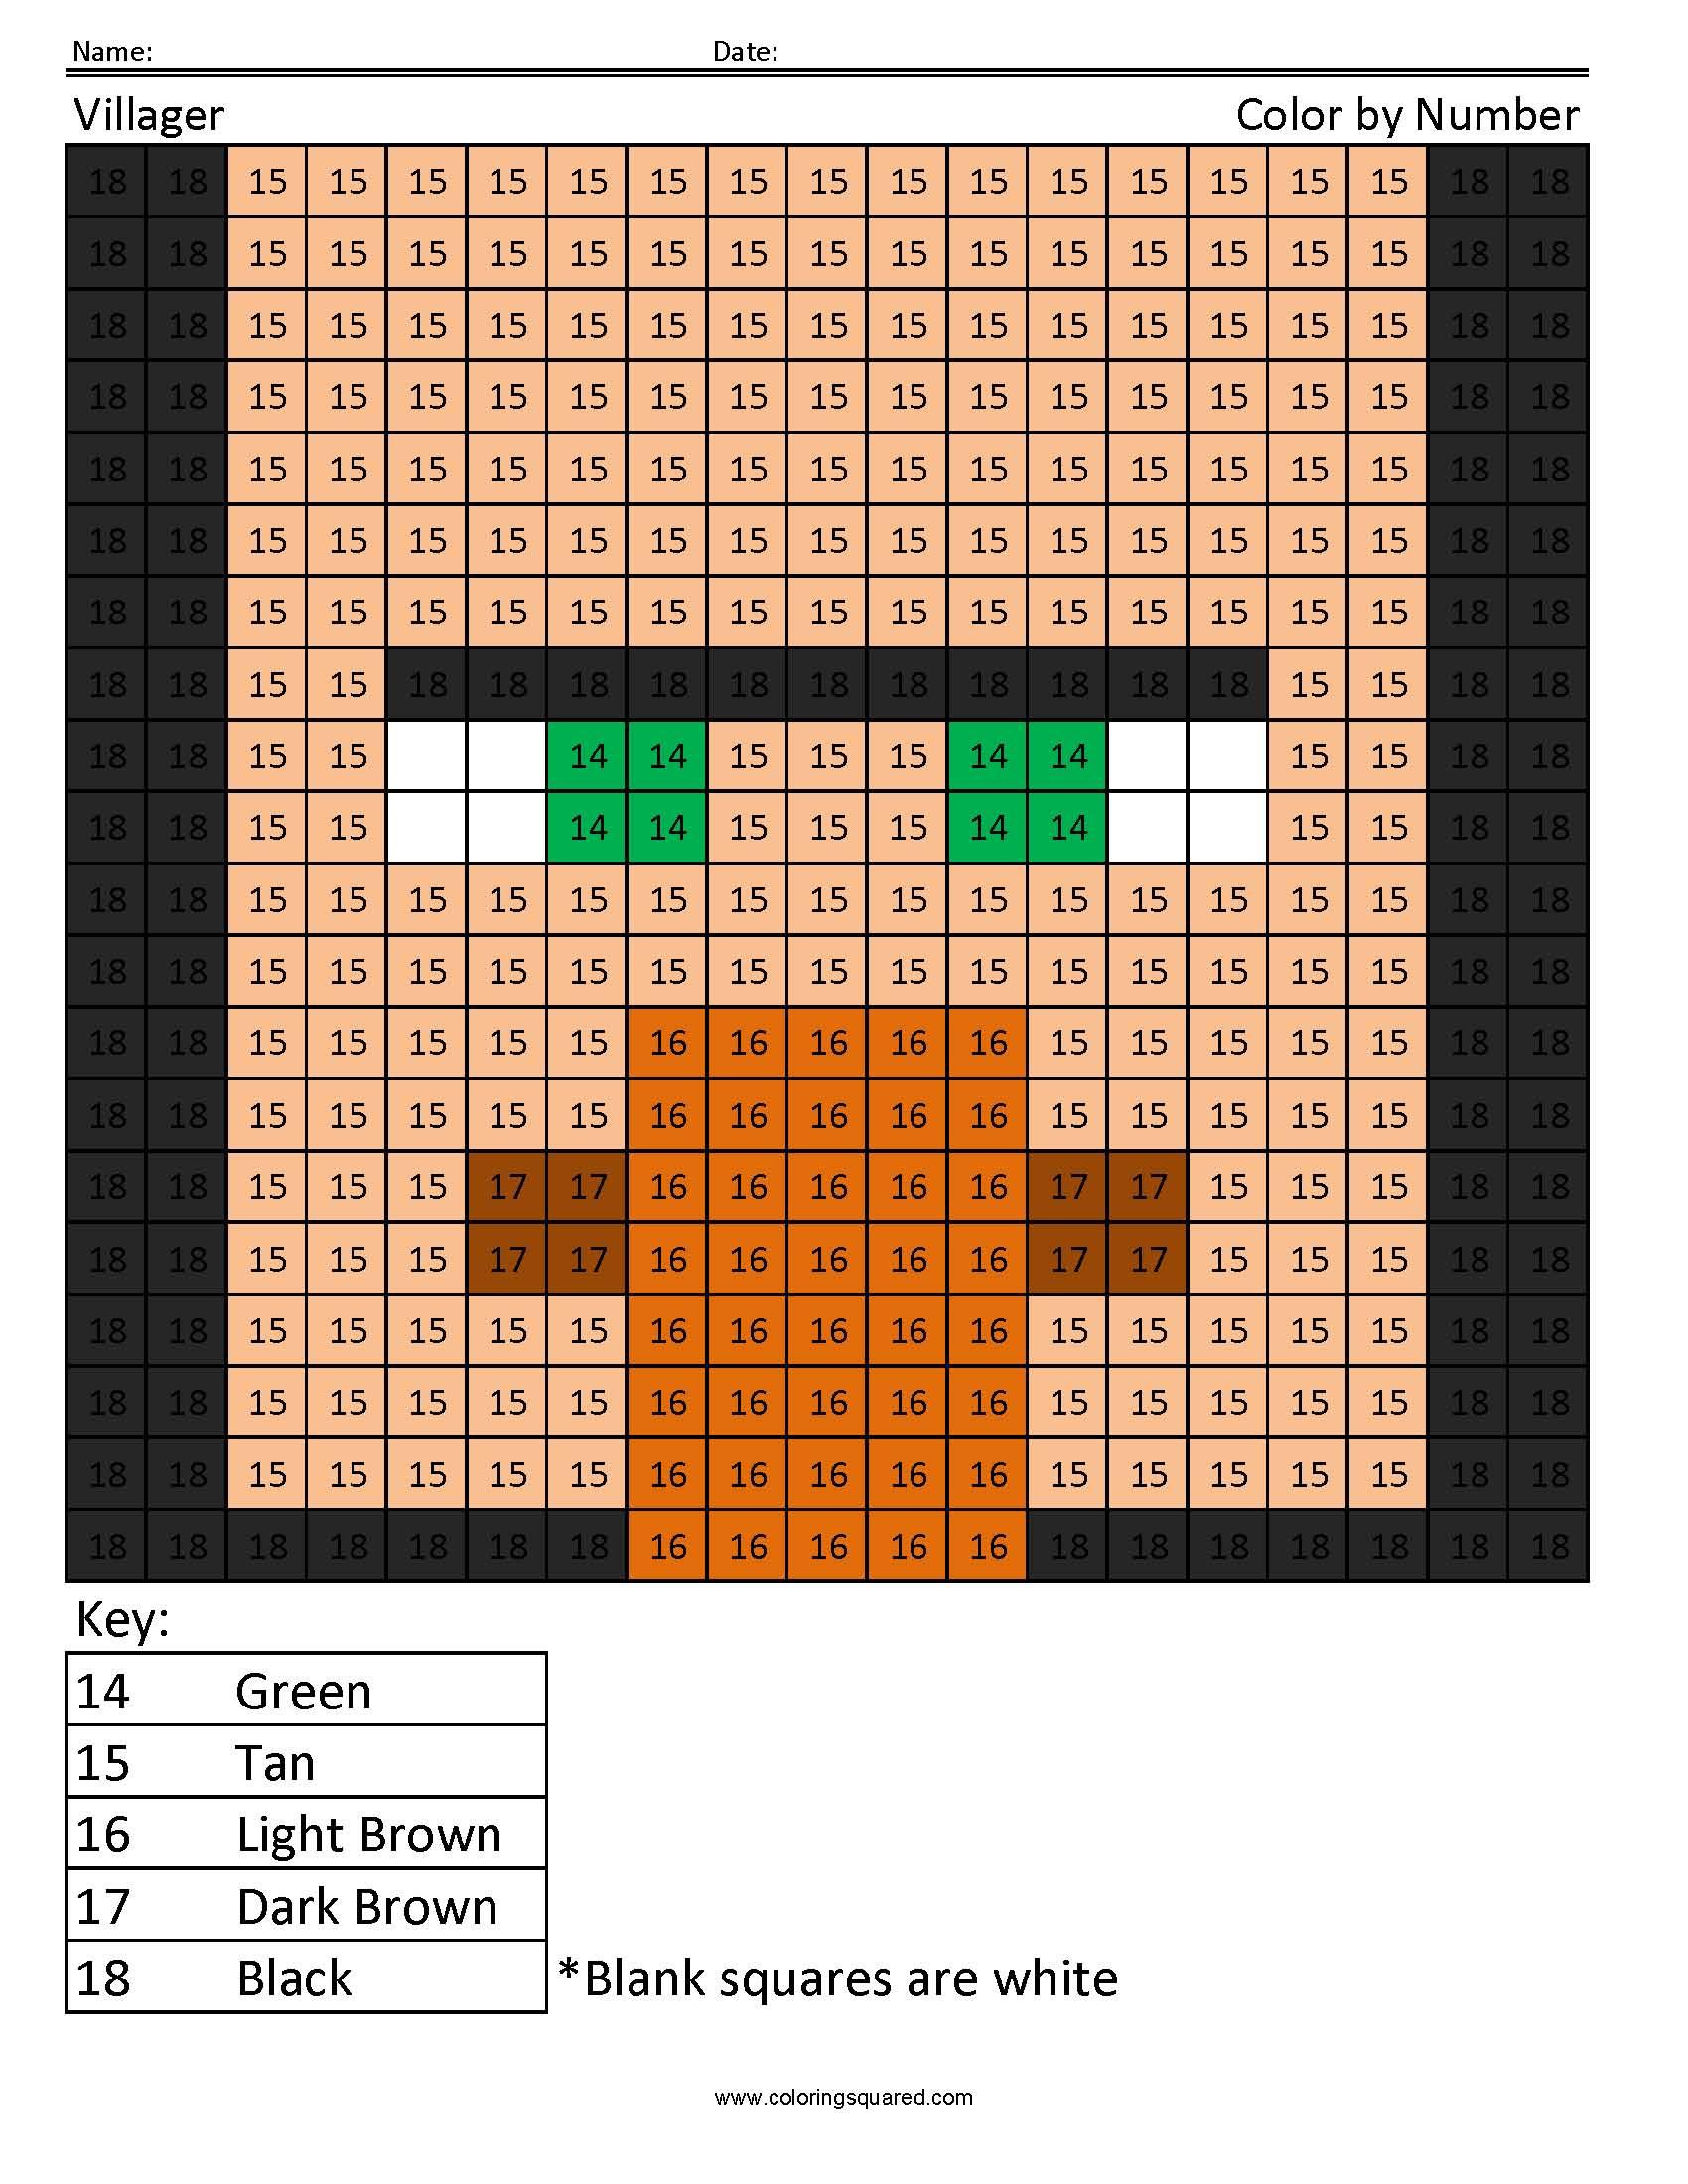 Villager Color By Number